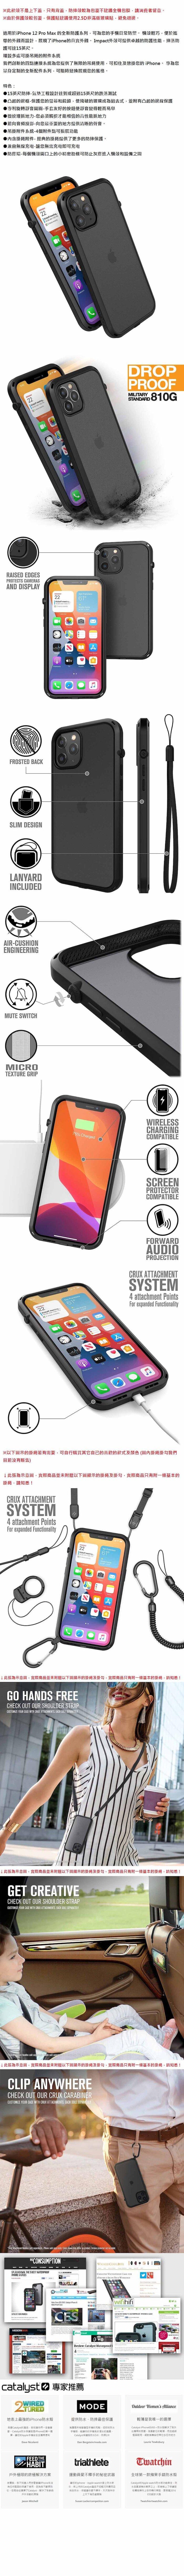 "CATALYST iPhone12 Pro Max (6.7"")防摔耐衝擊保護殼-霧黑"